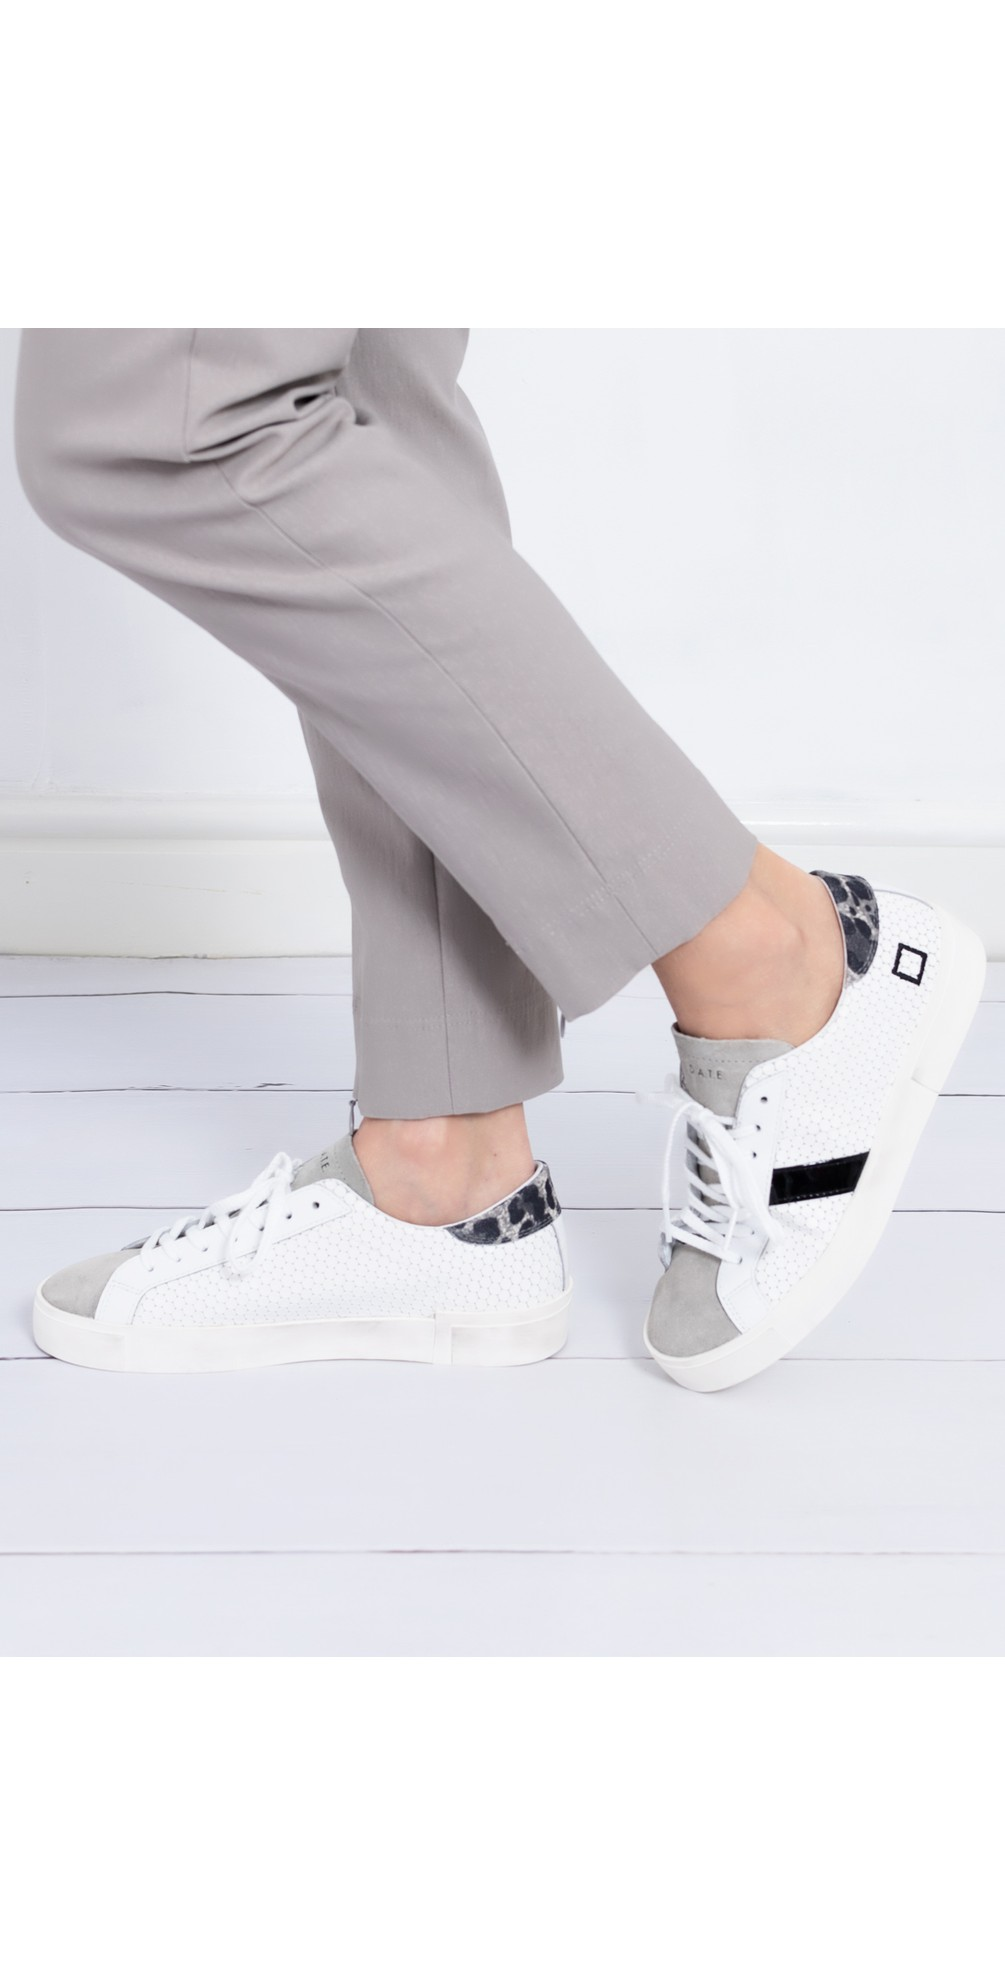 Hill Low Pong Low Top Sneaker main image